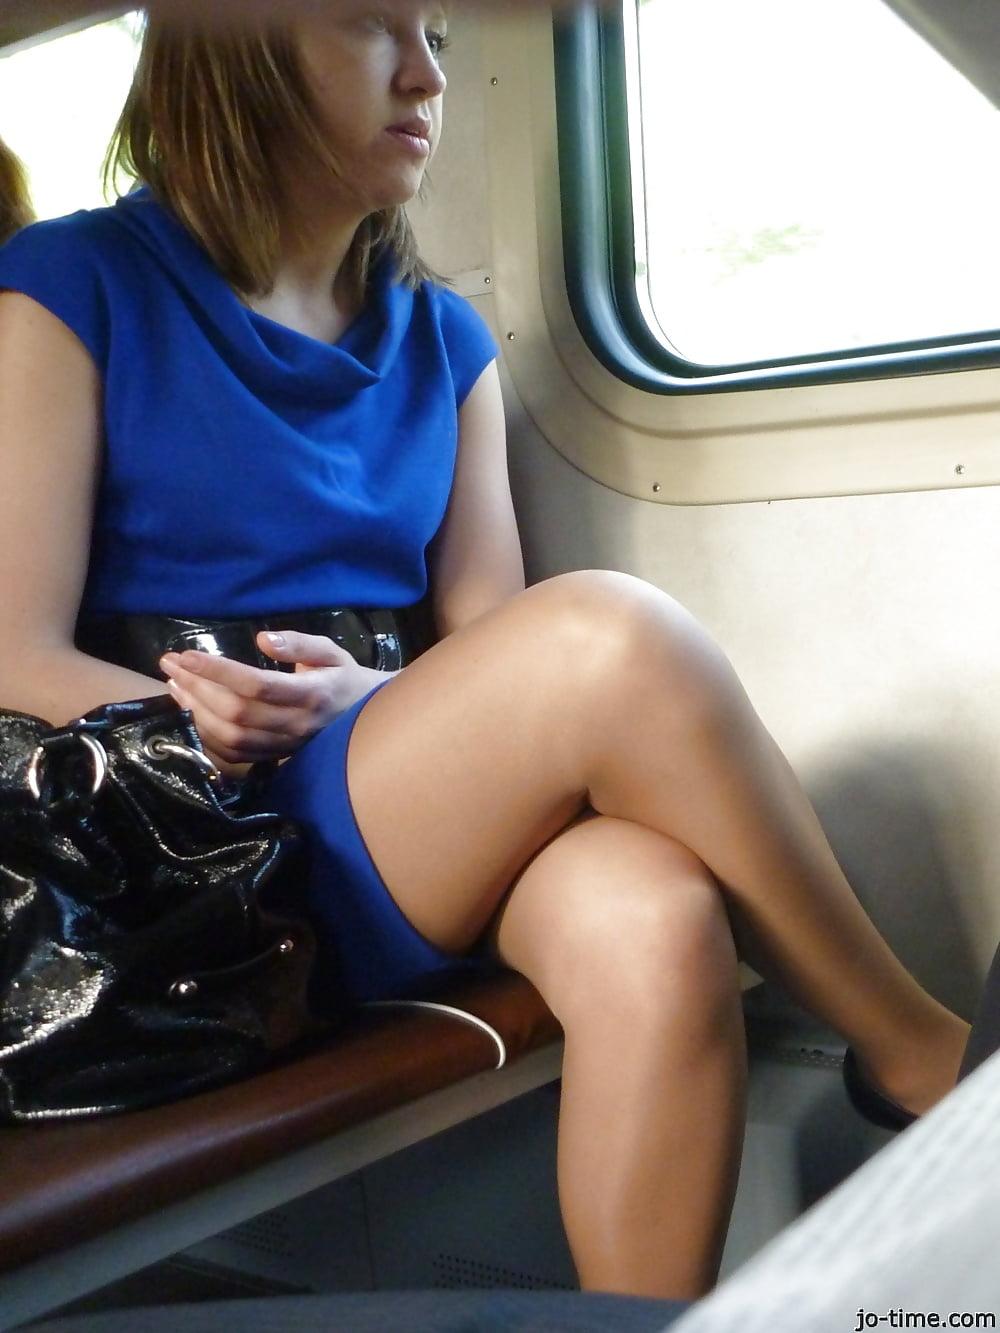 видео девушки в транспорте - 8